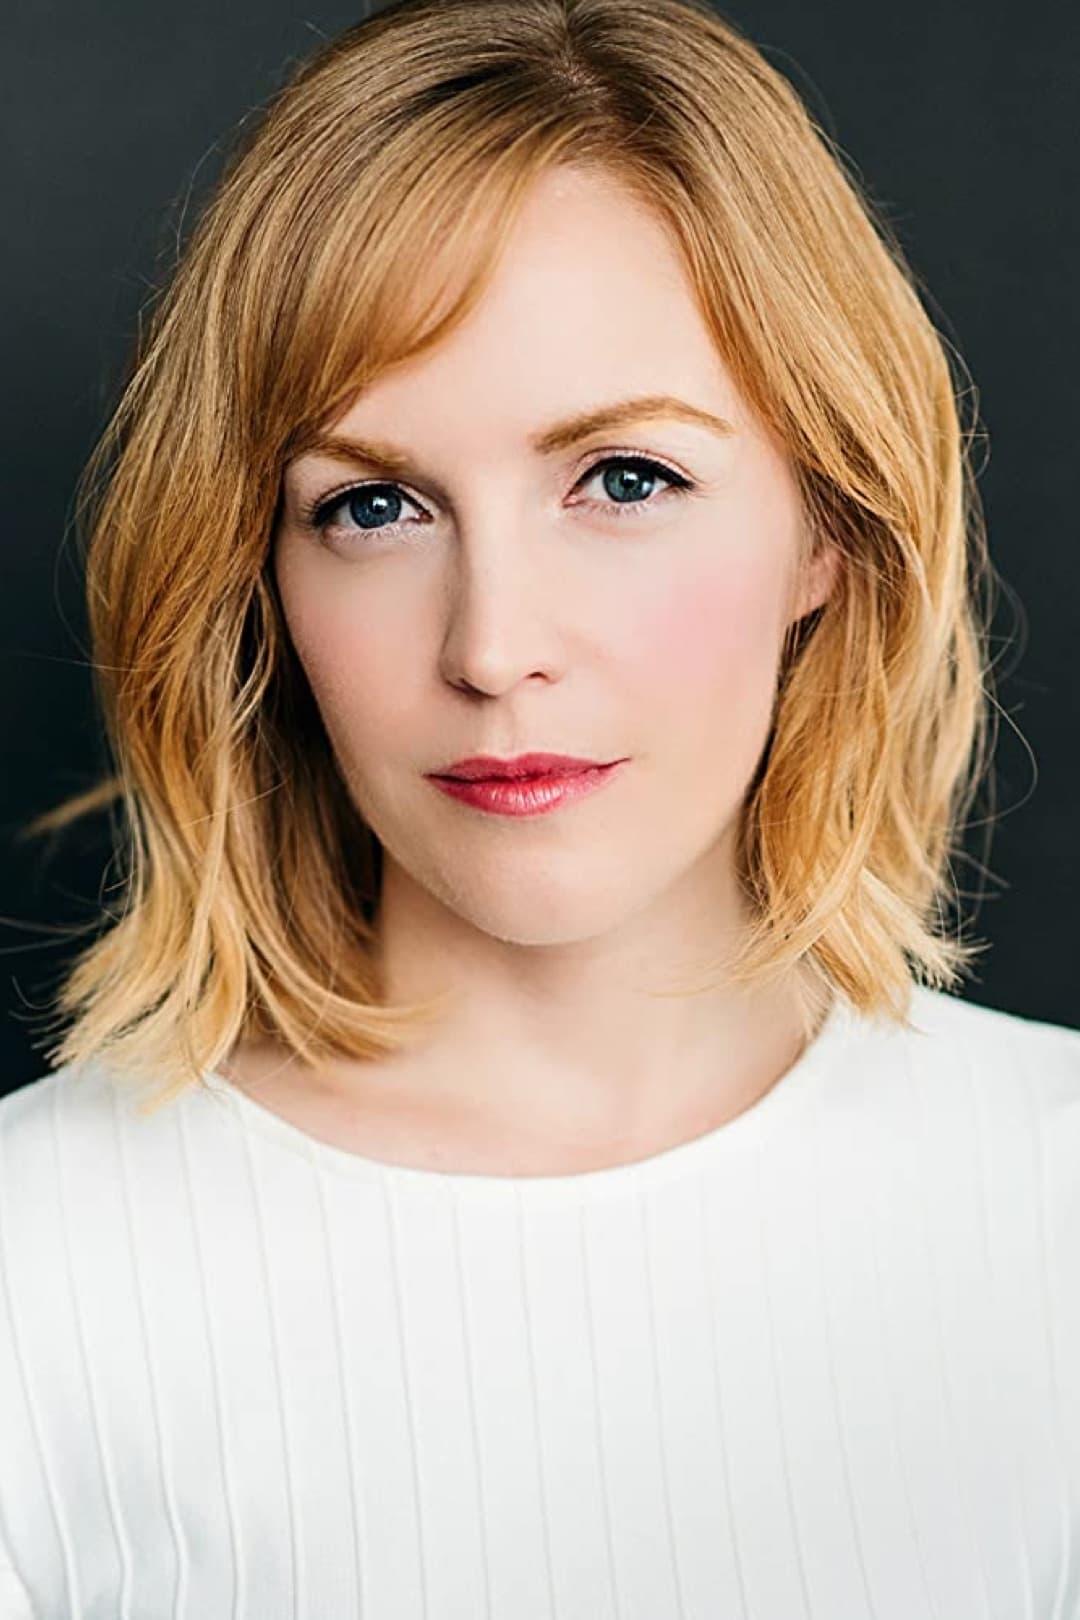 Victoria Kucher